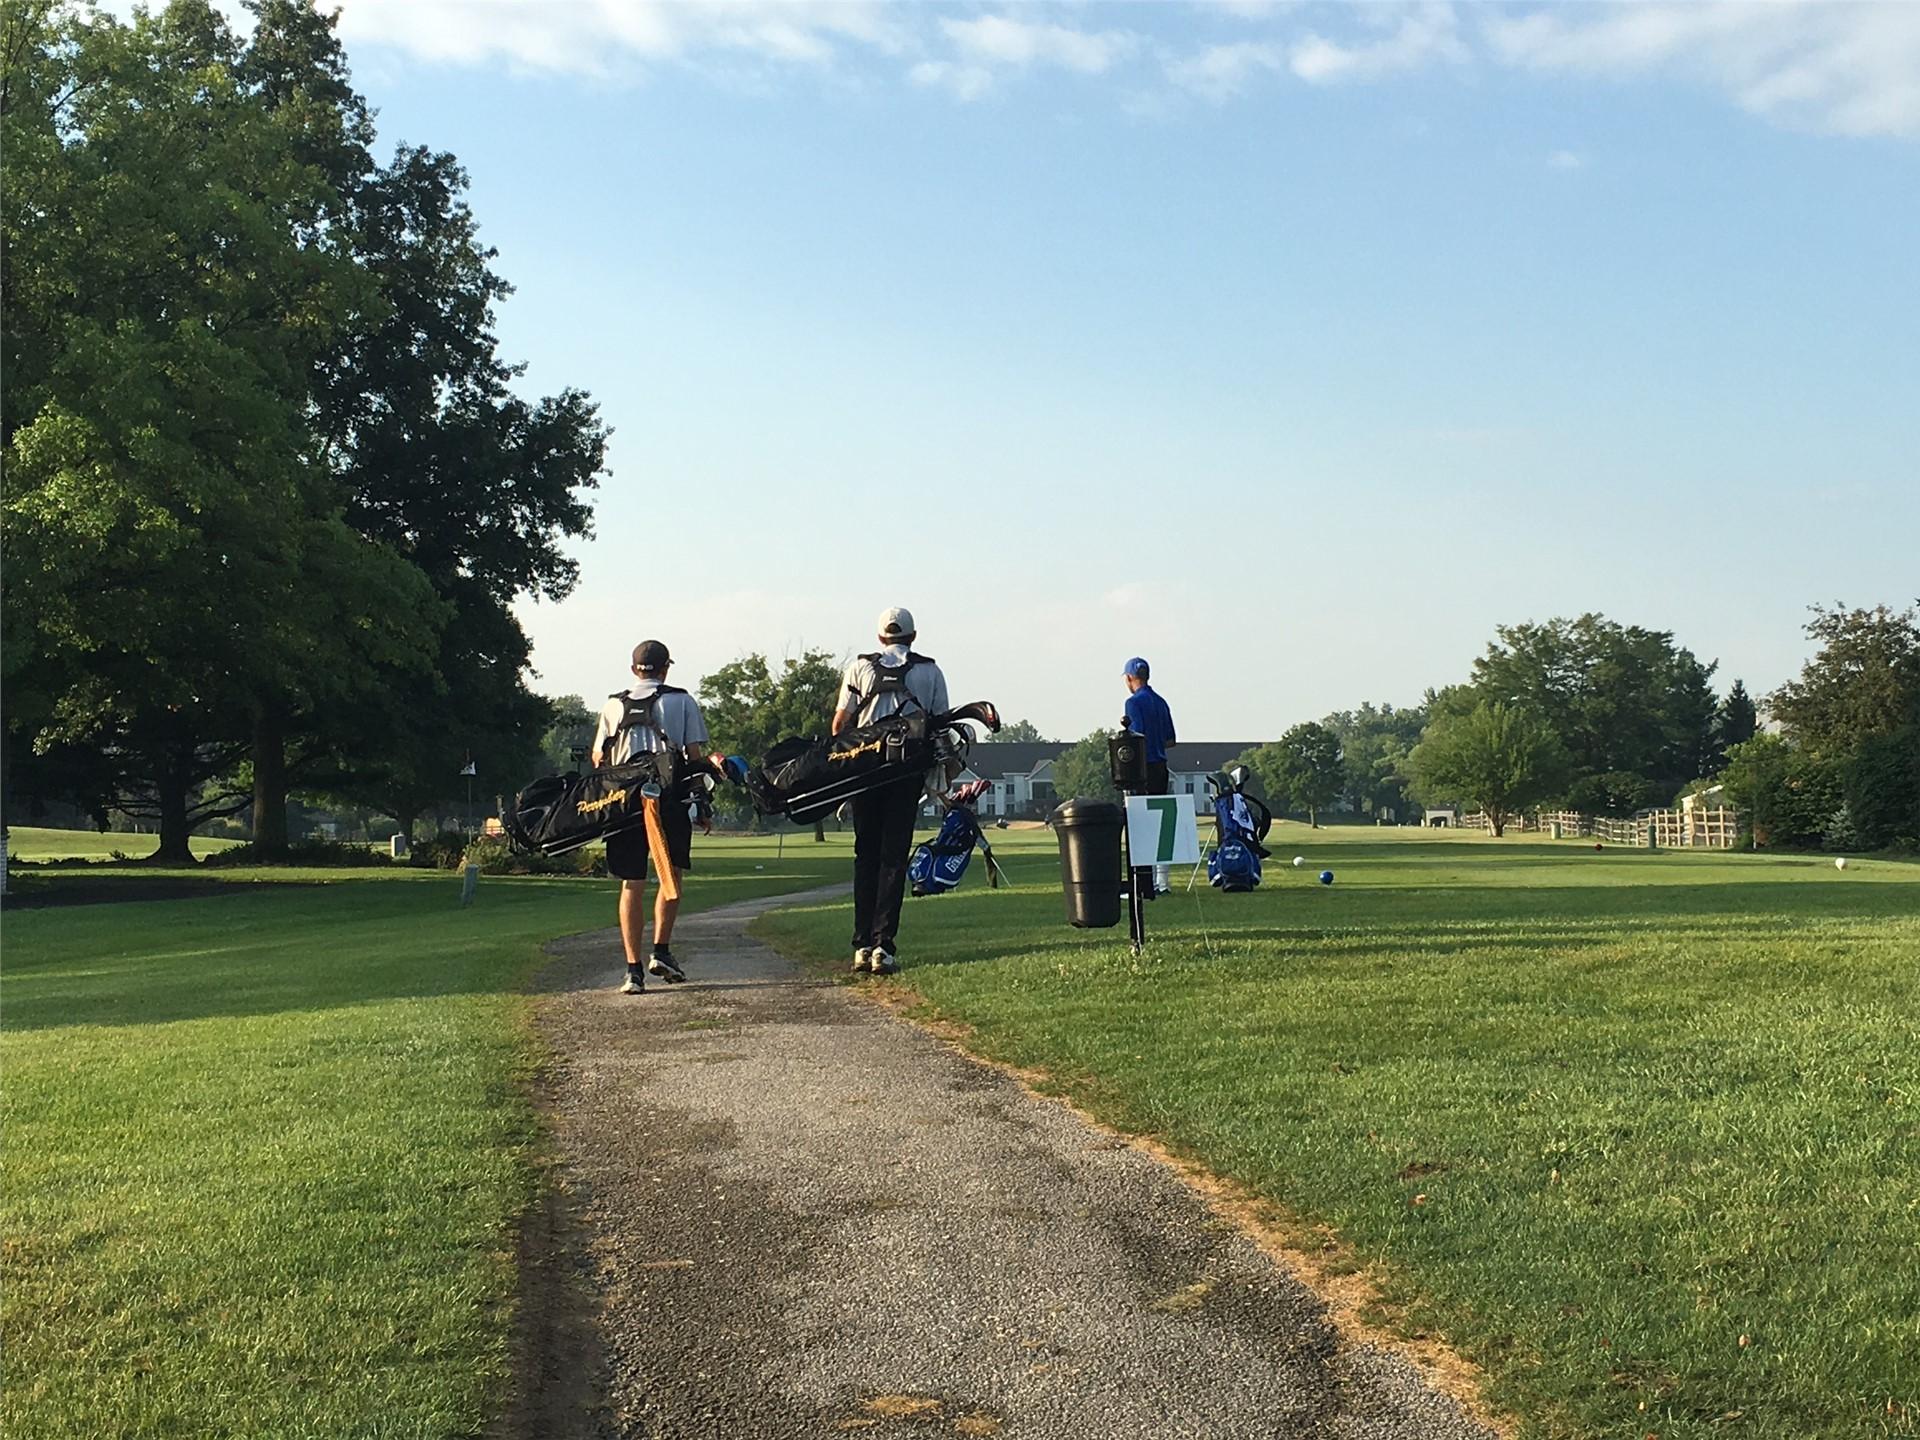 PHS student athletes walking to their golf balls